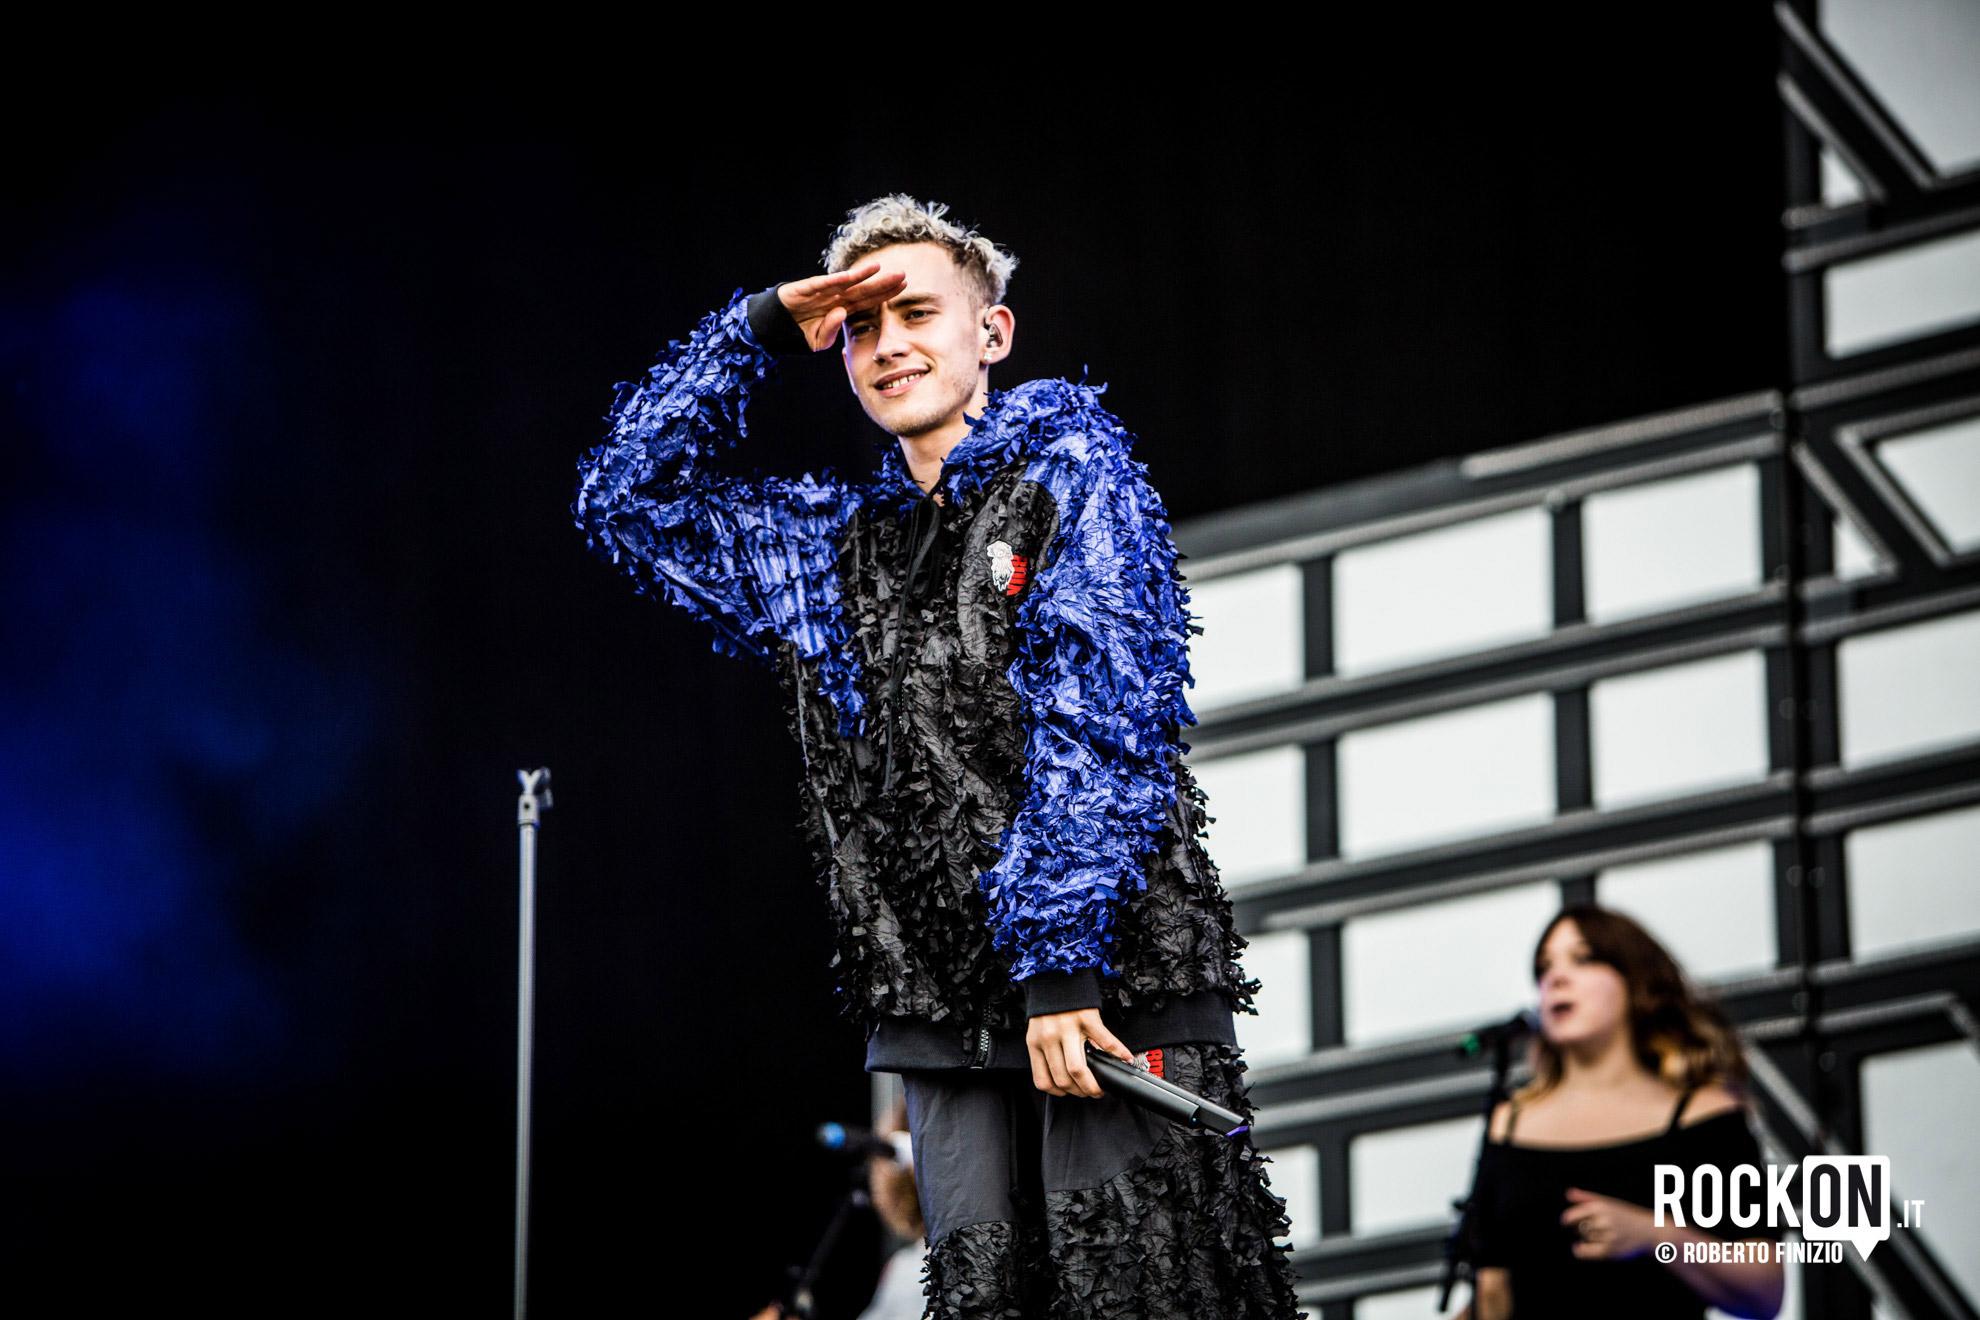 Years-&-Years-@-Pinkpop-Festival-2016-Landgraaf-Netherlands-NL-10th-june-2016-ph-Roberto-Finizio-0659